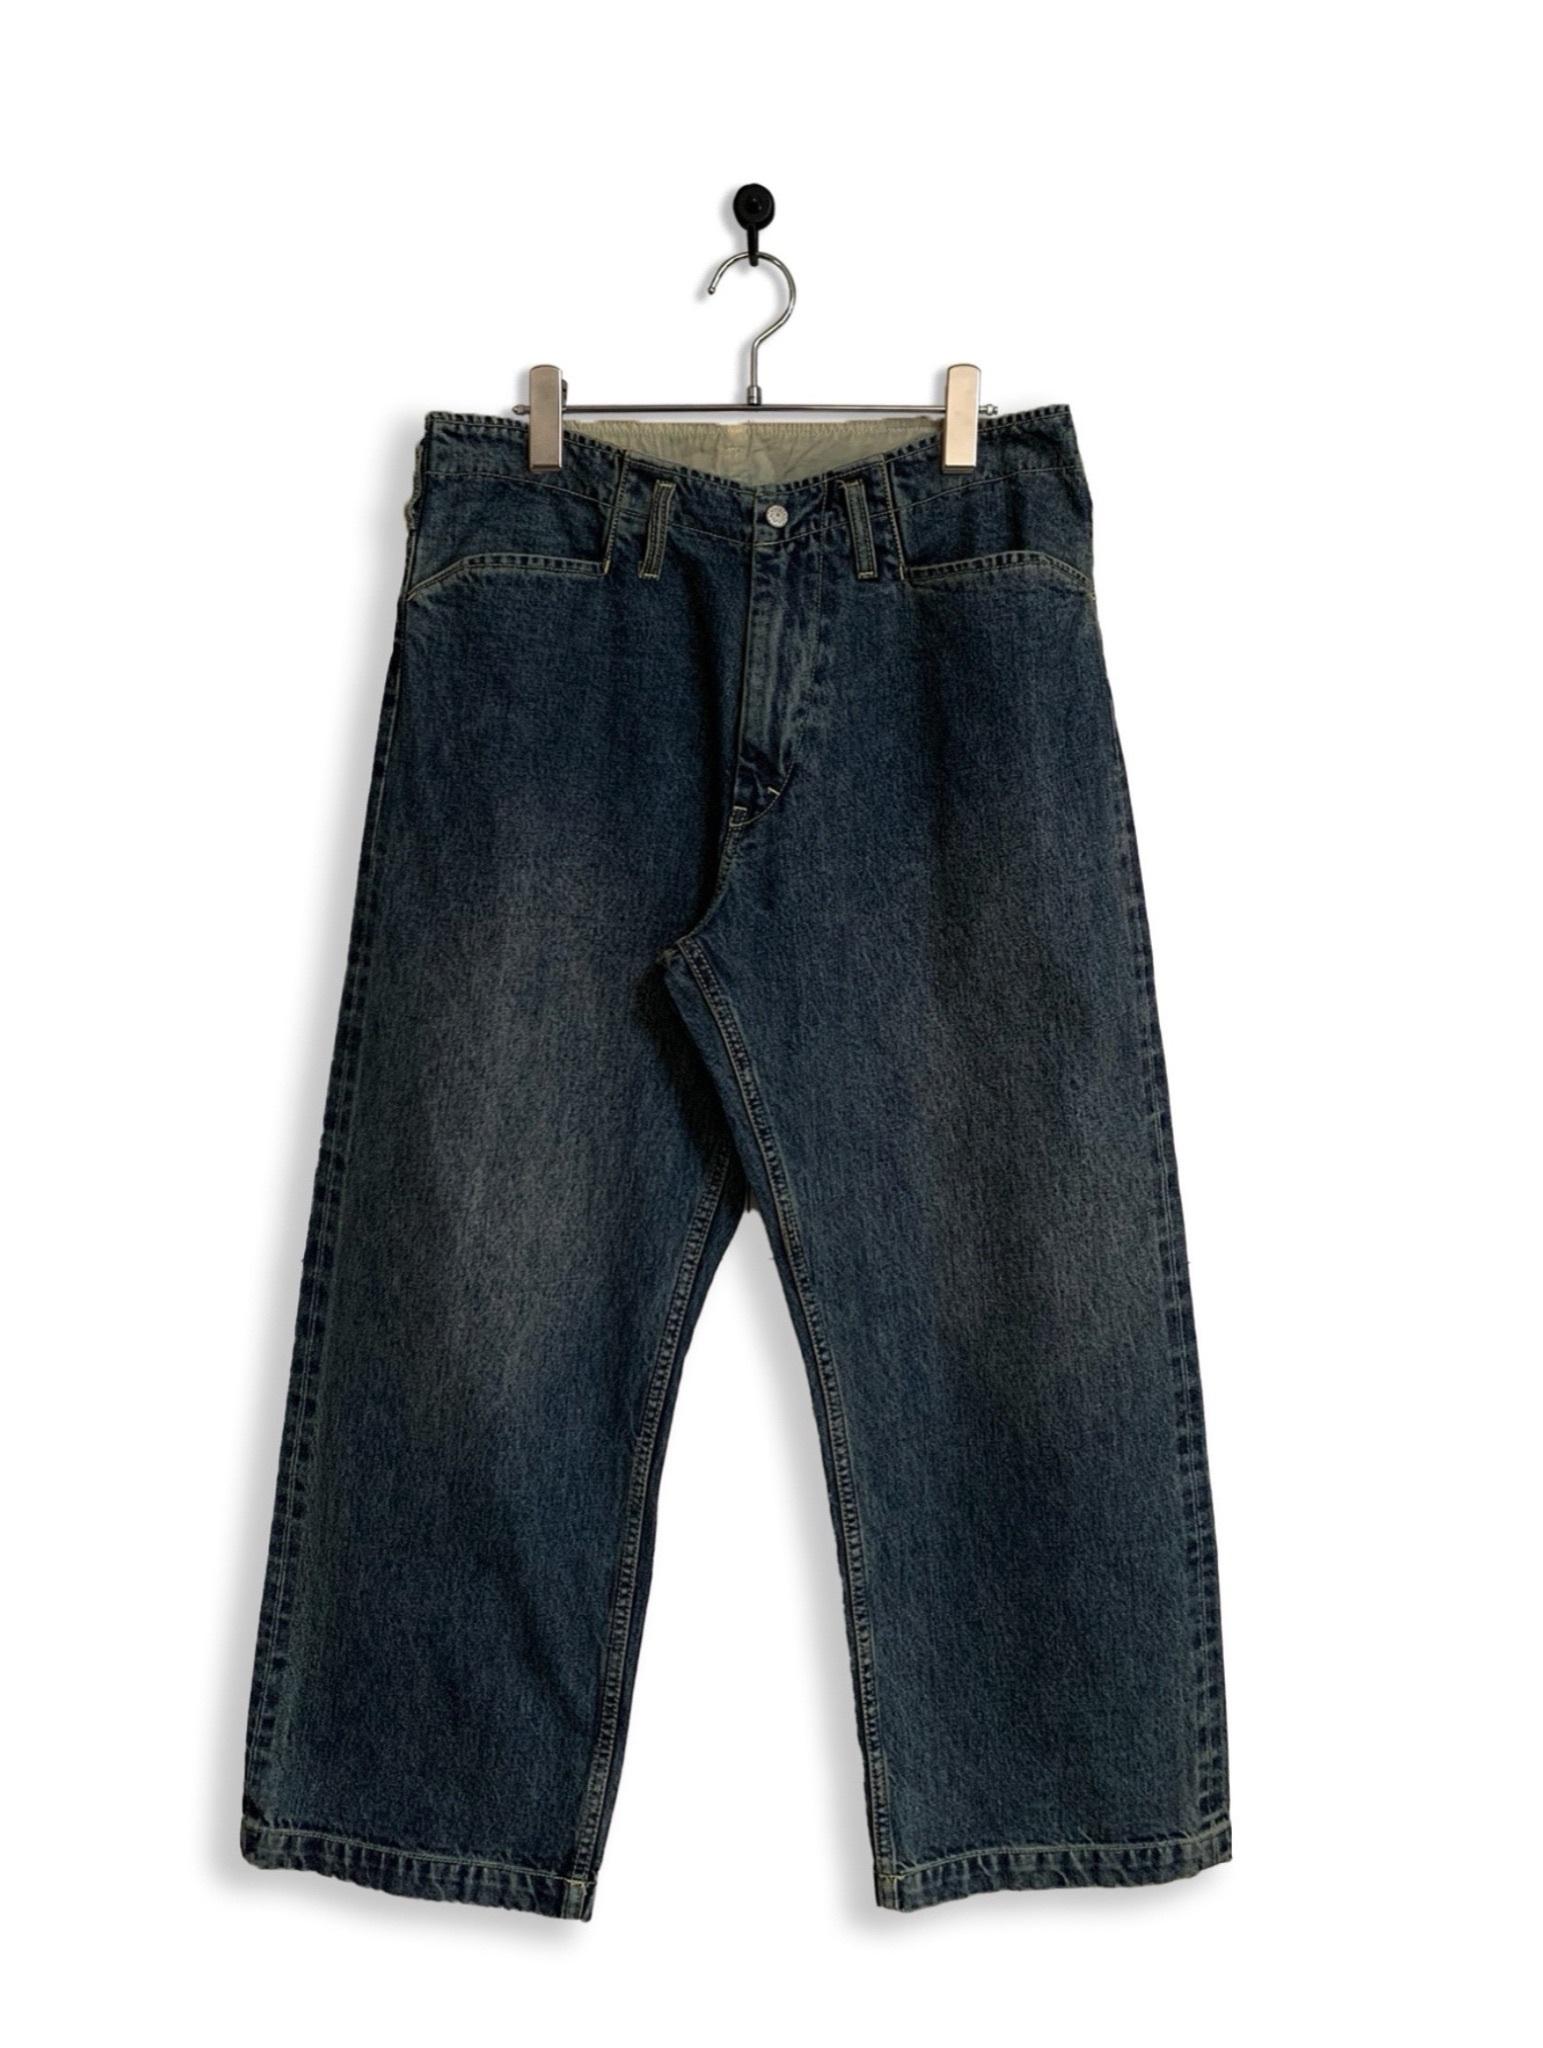 12.5oz Denim Frisco Pants / special wash / dark